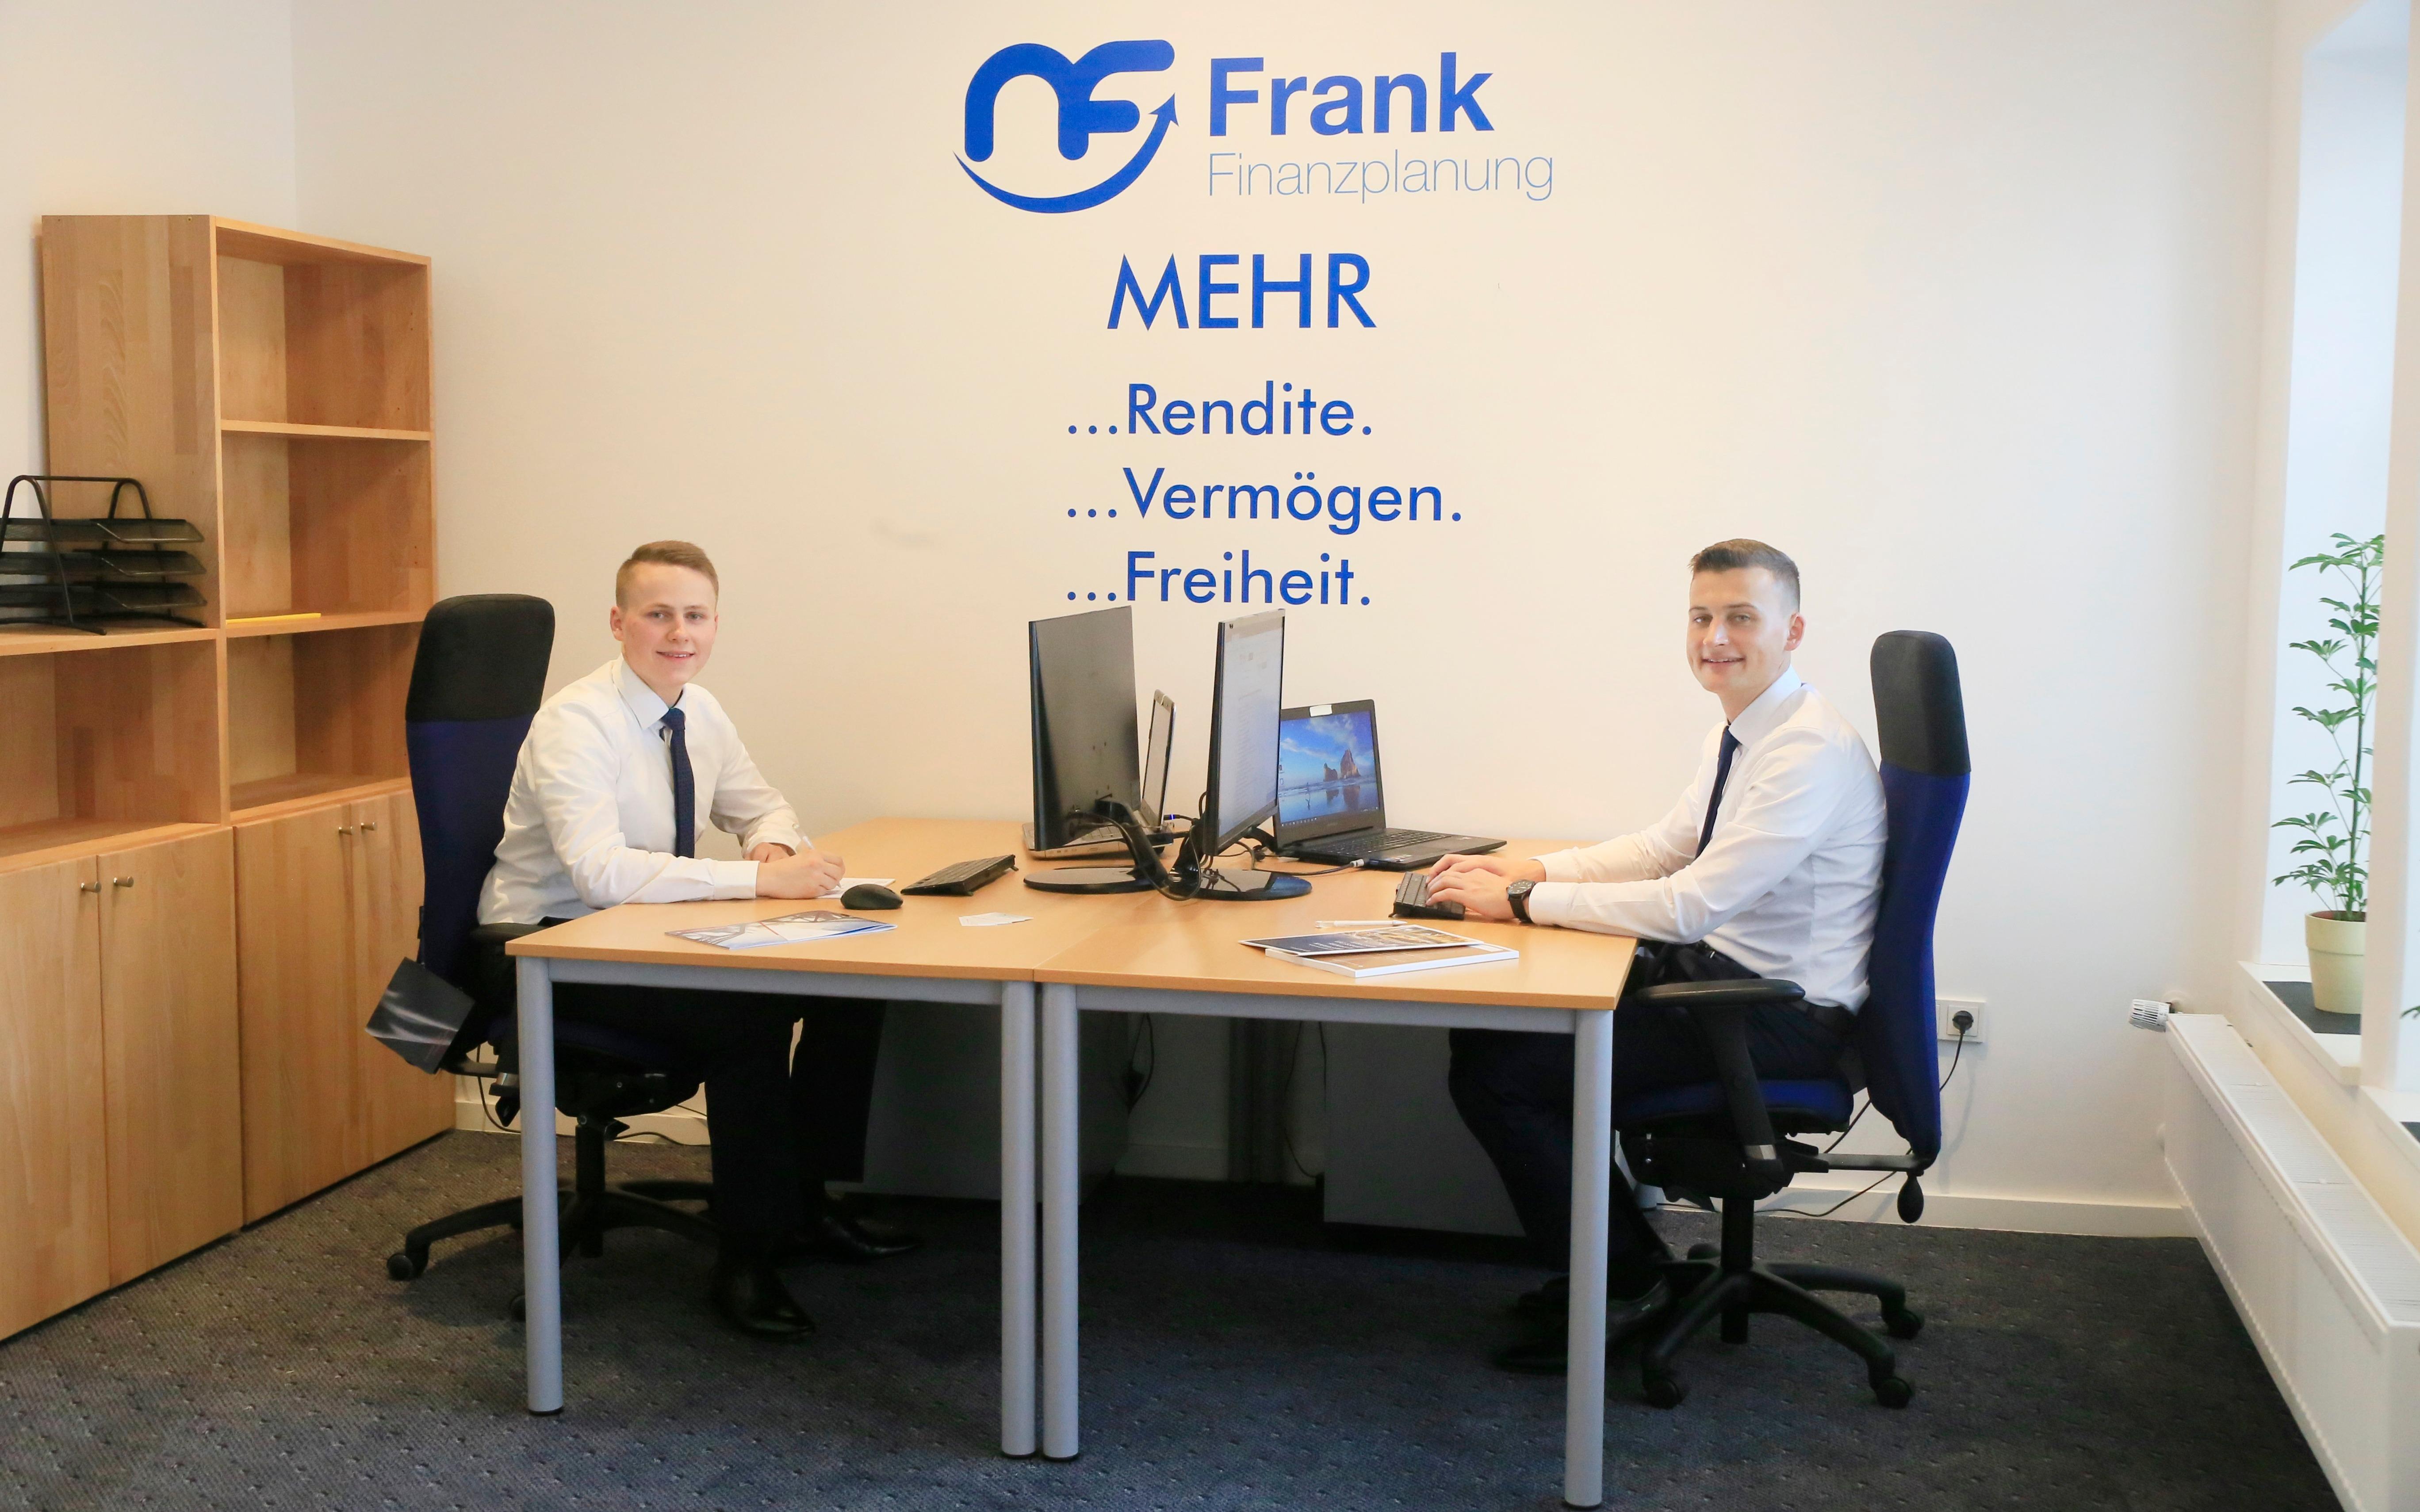 Frank Finanzplanung Pronsfeld